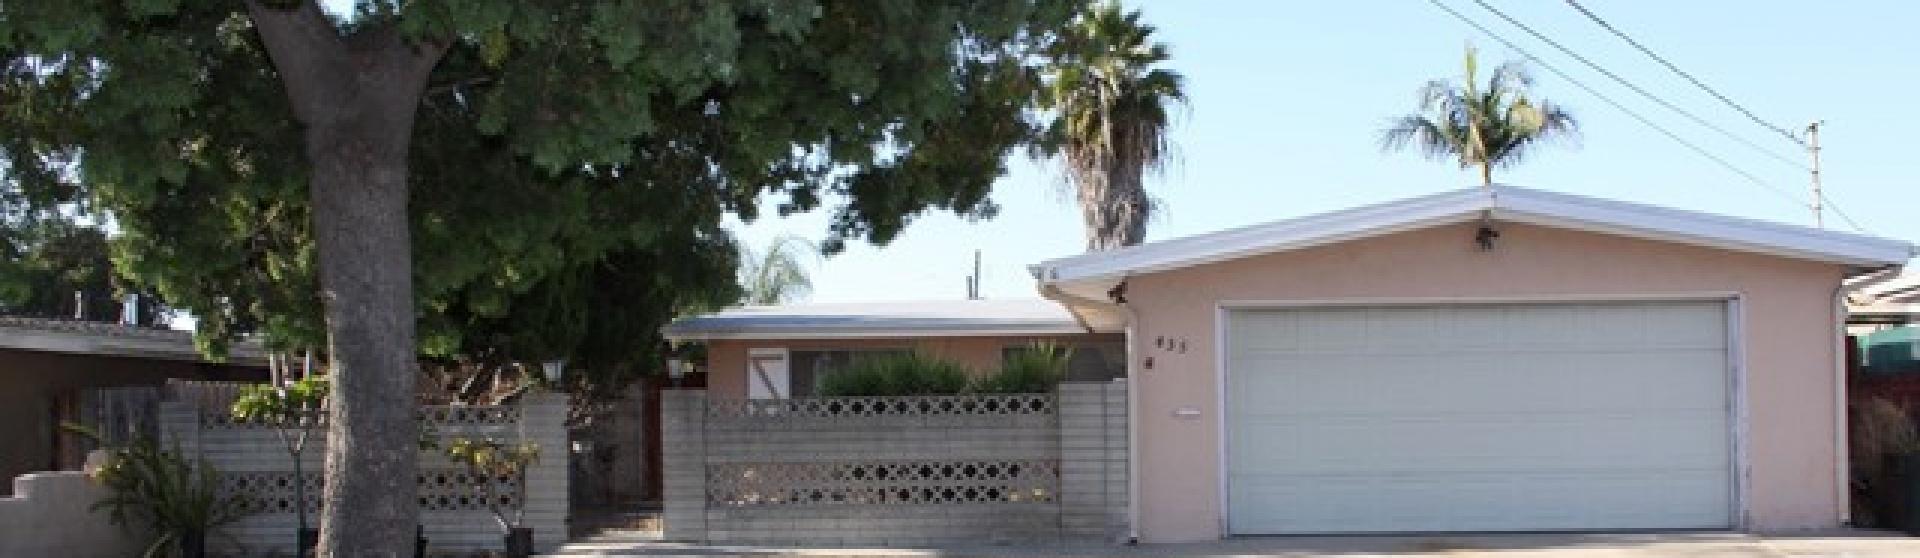 435 Montcalm Street,Chula Vista,California,3 Bedrooms Bedrooms,2 BathroomsBathrooms,House,Montcalm Street,1002